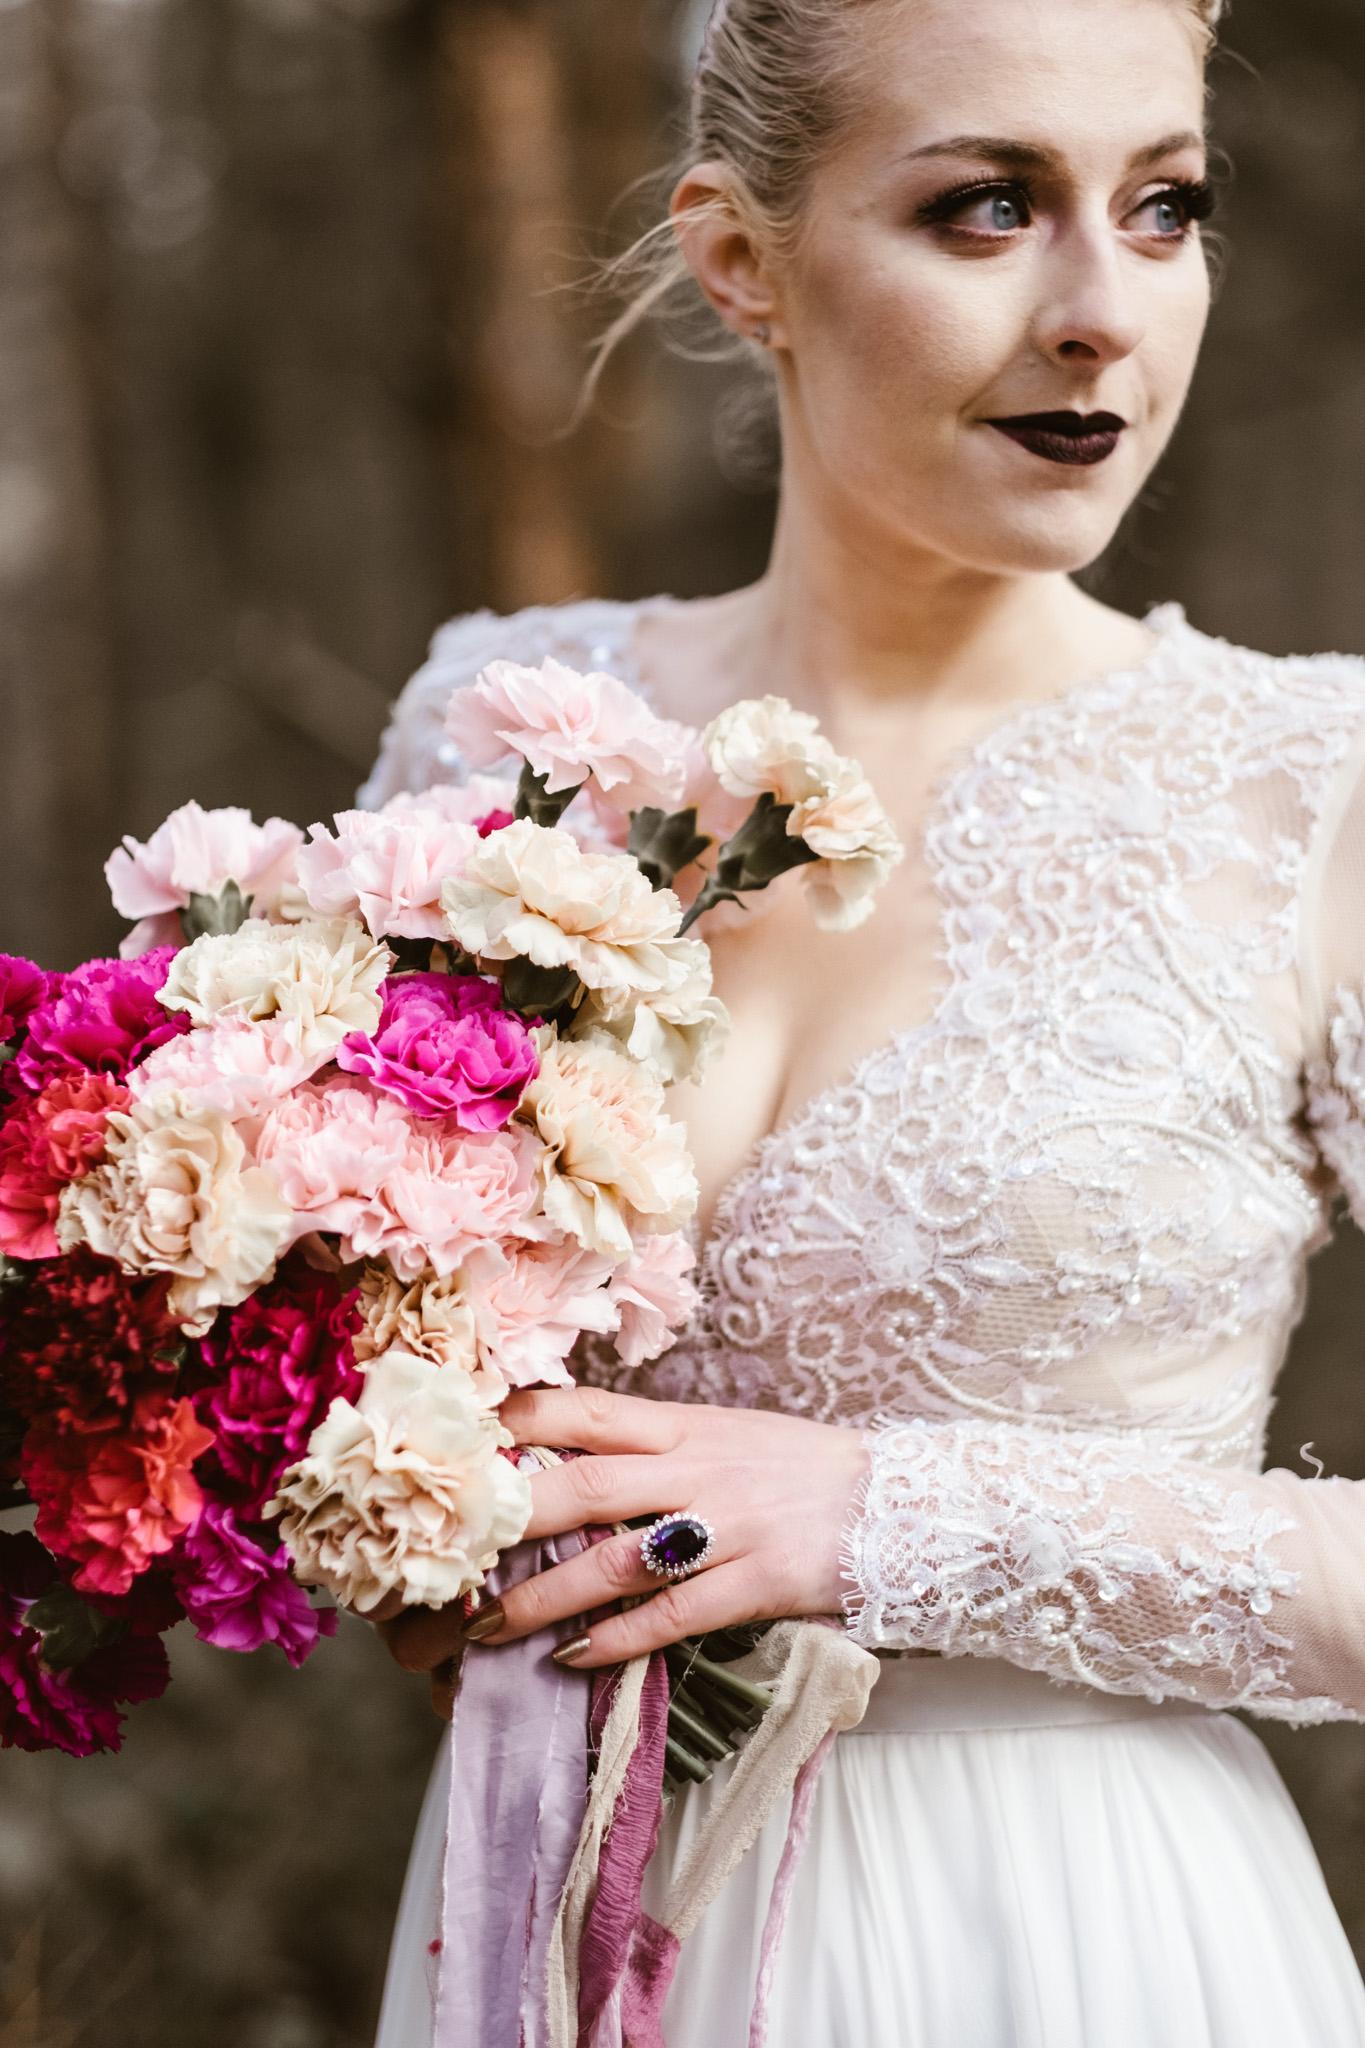 Captains-Wood-Barn-Alterative-Rustic-Vintage-Essex-Wedding-Suffolk-Grace-Elizabeth-19.jpg